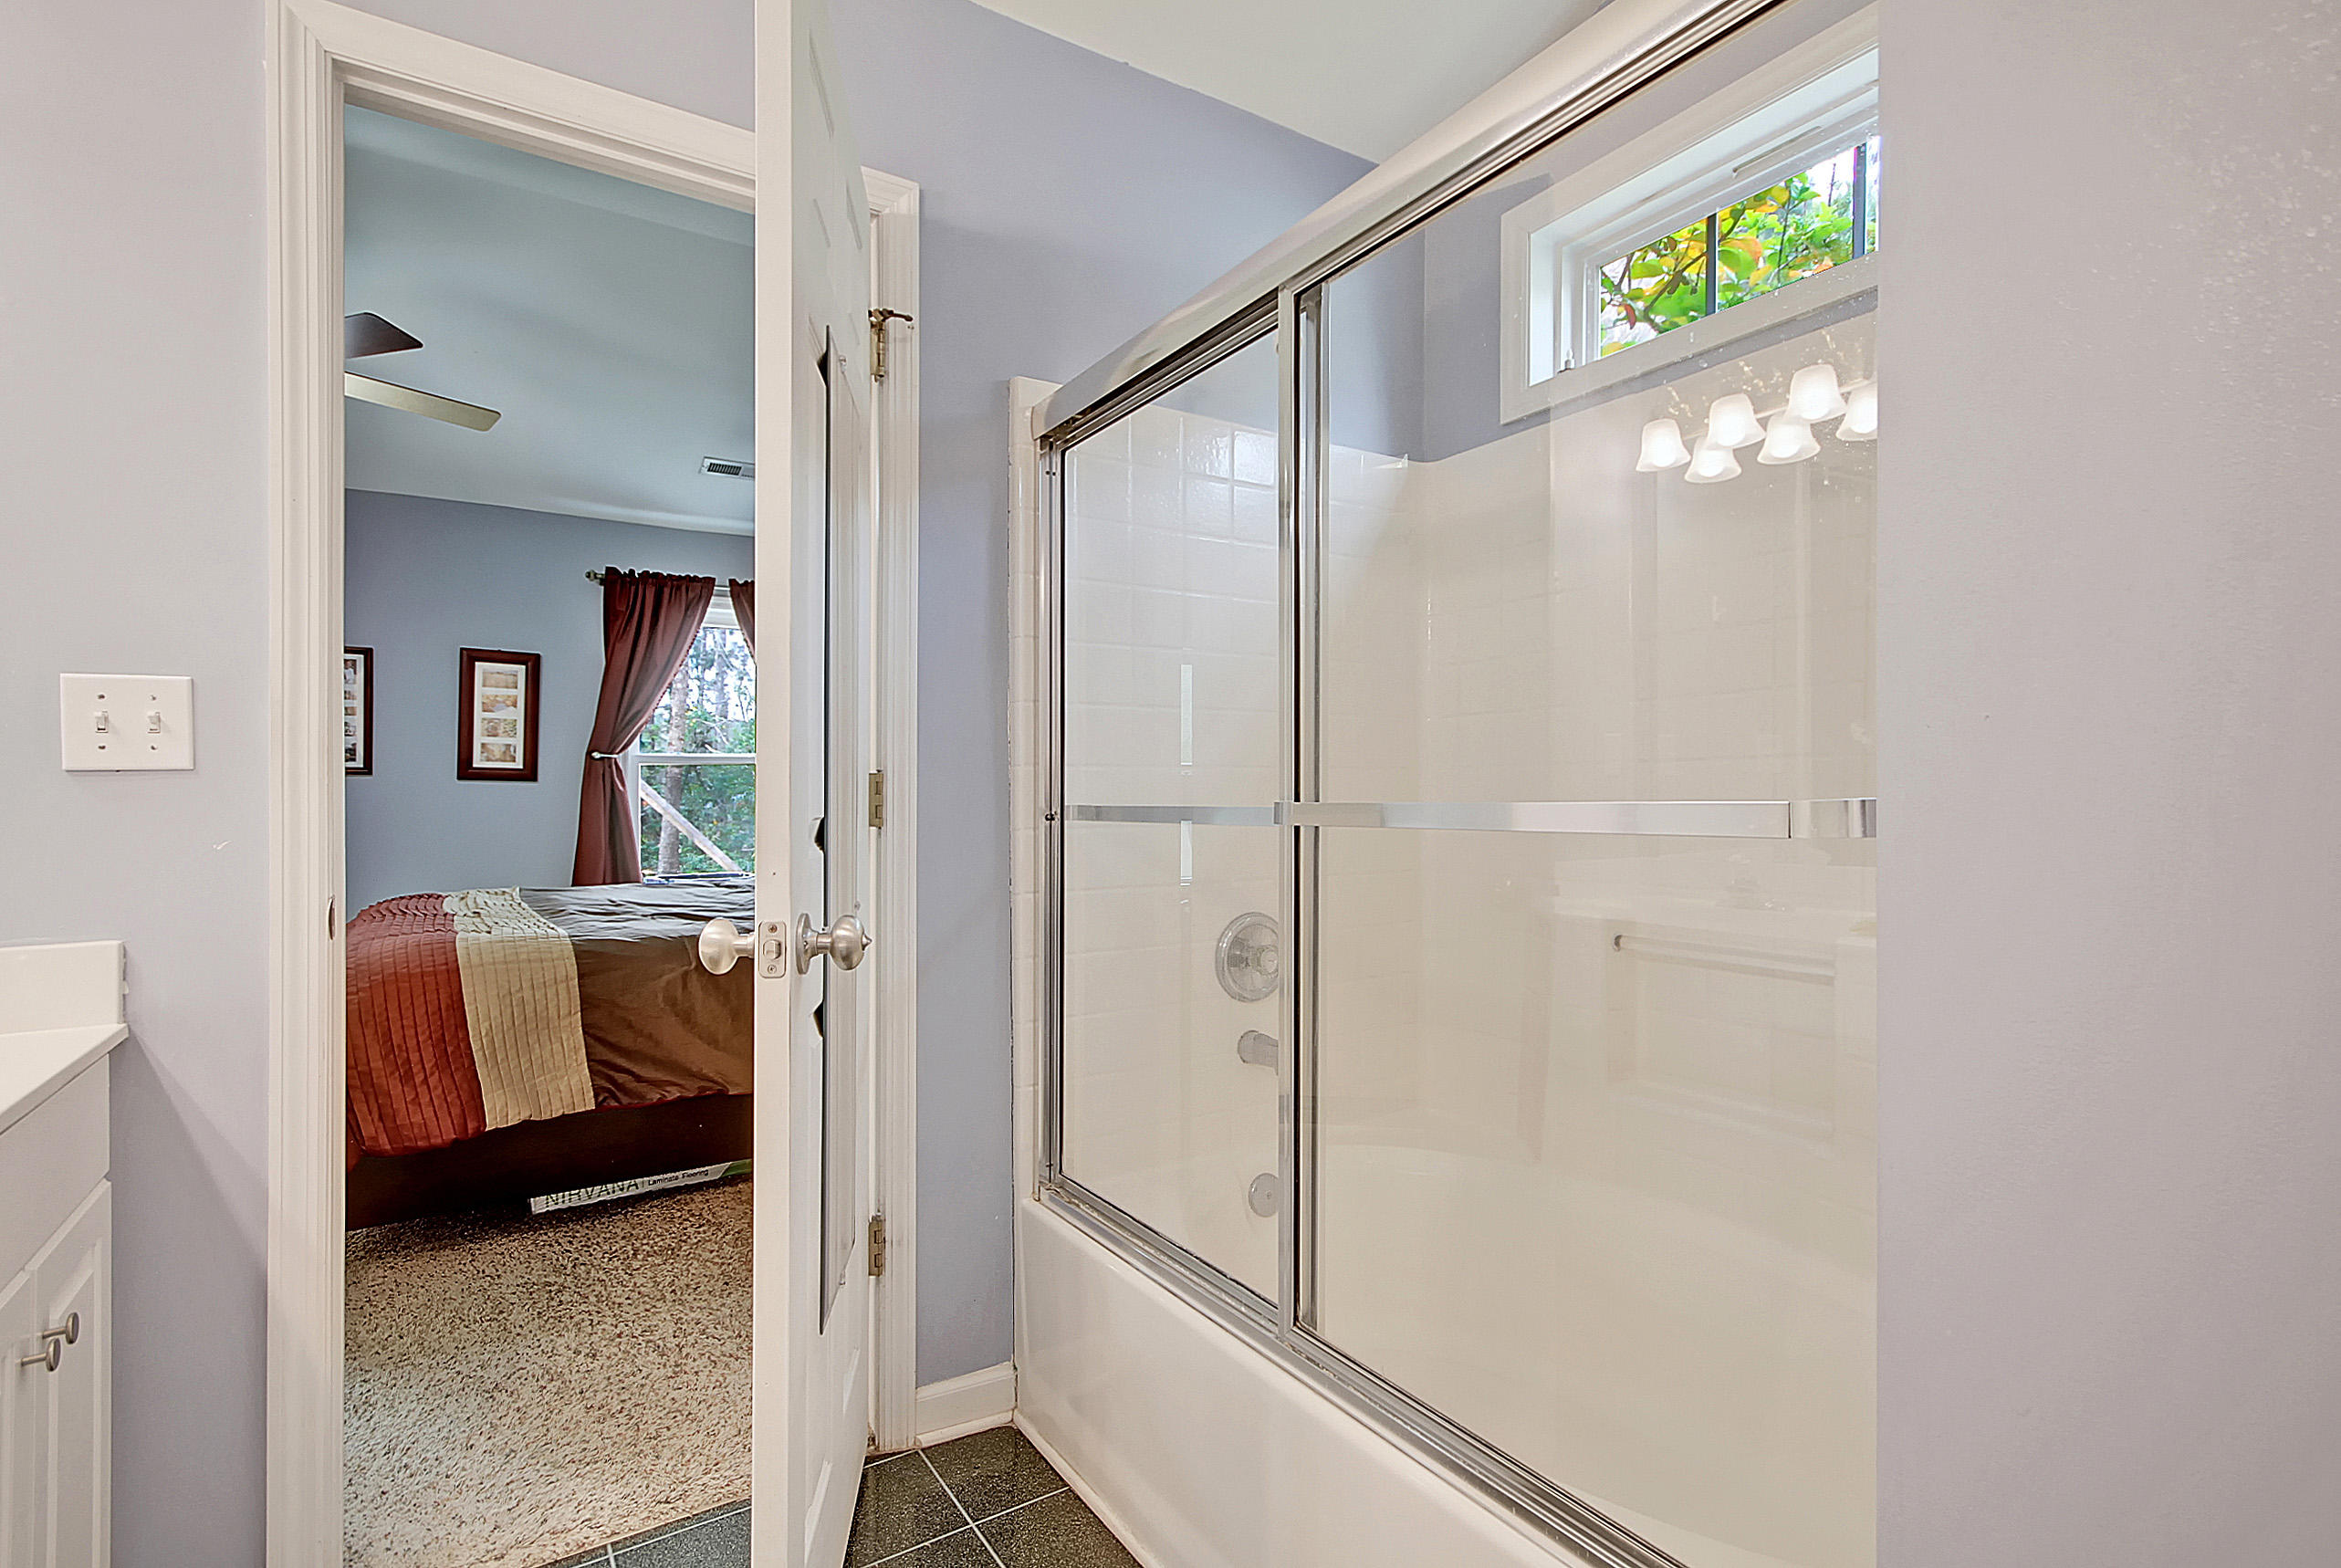 Park West Homes For Sale - 1460 Wellesley, Mount Pleasant, SC - 30